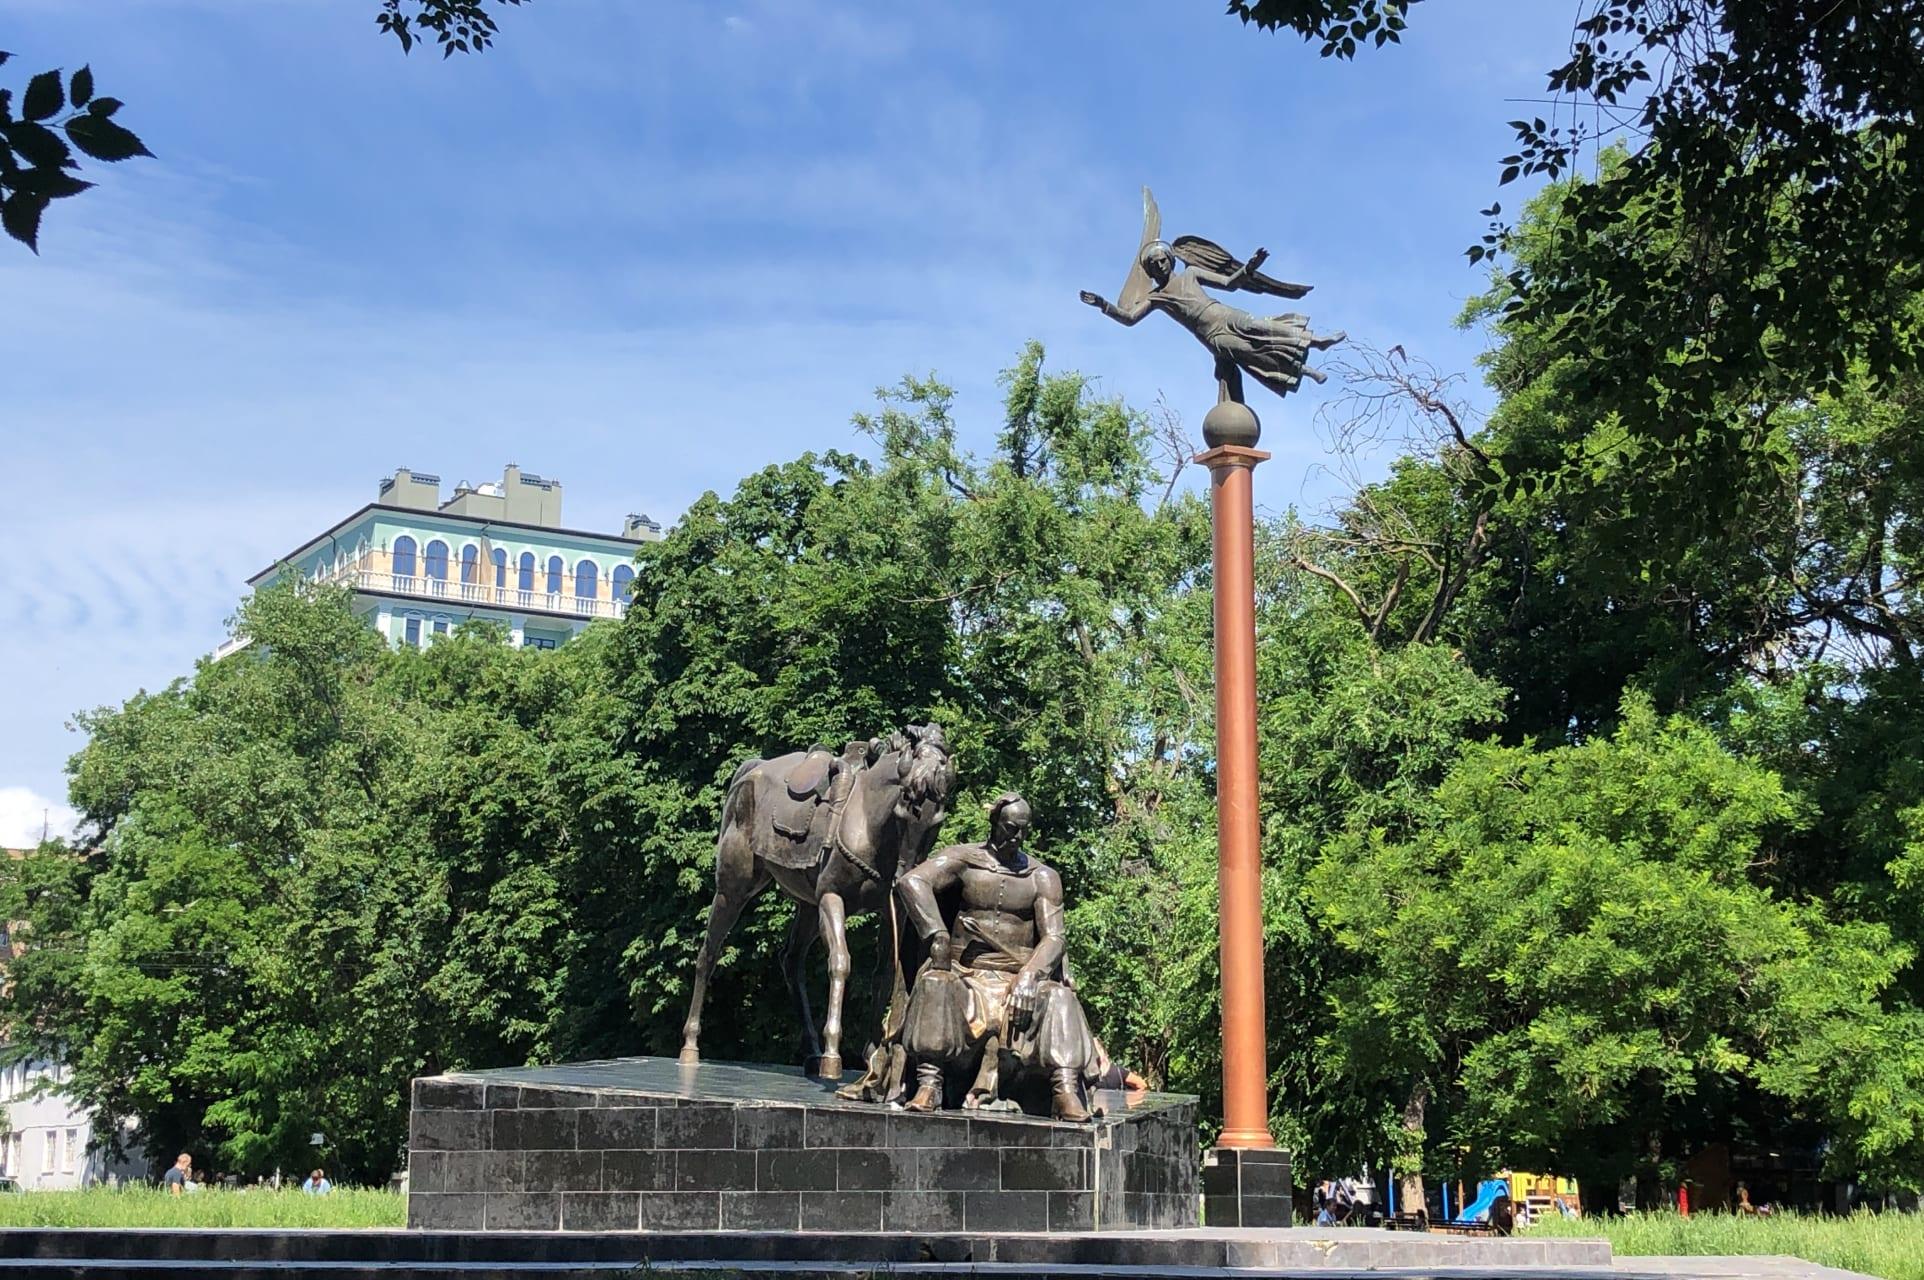 Odessa - Jewish Odessa Tour Part 5. A Stroll Along Bazarnaya Street Continues